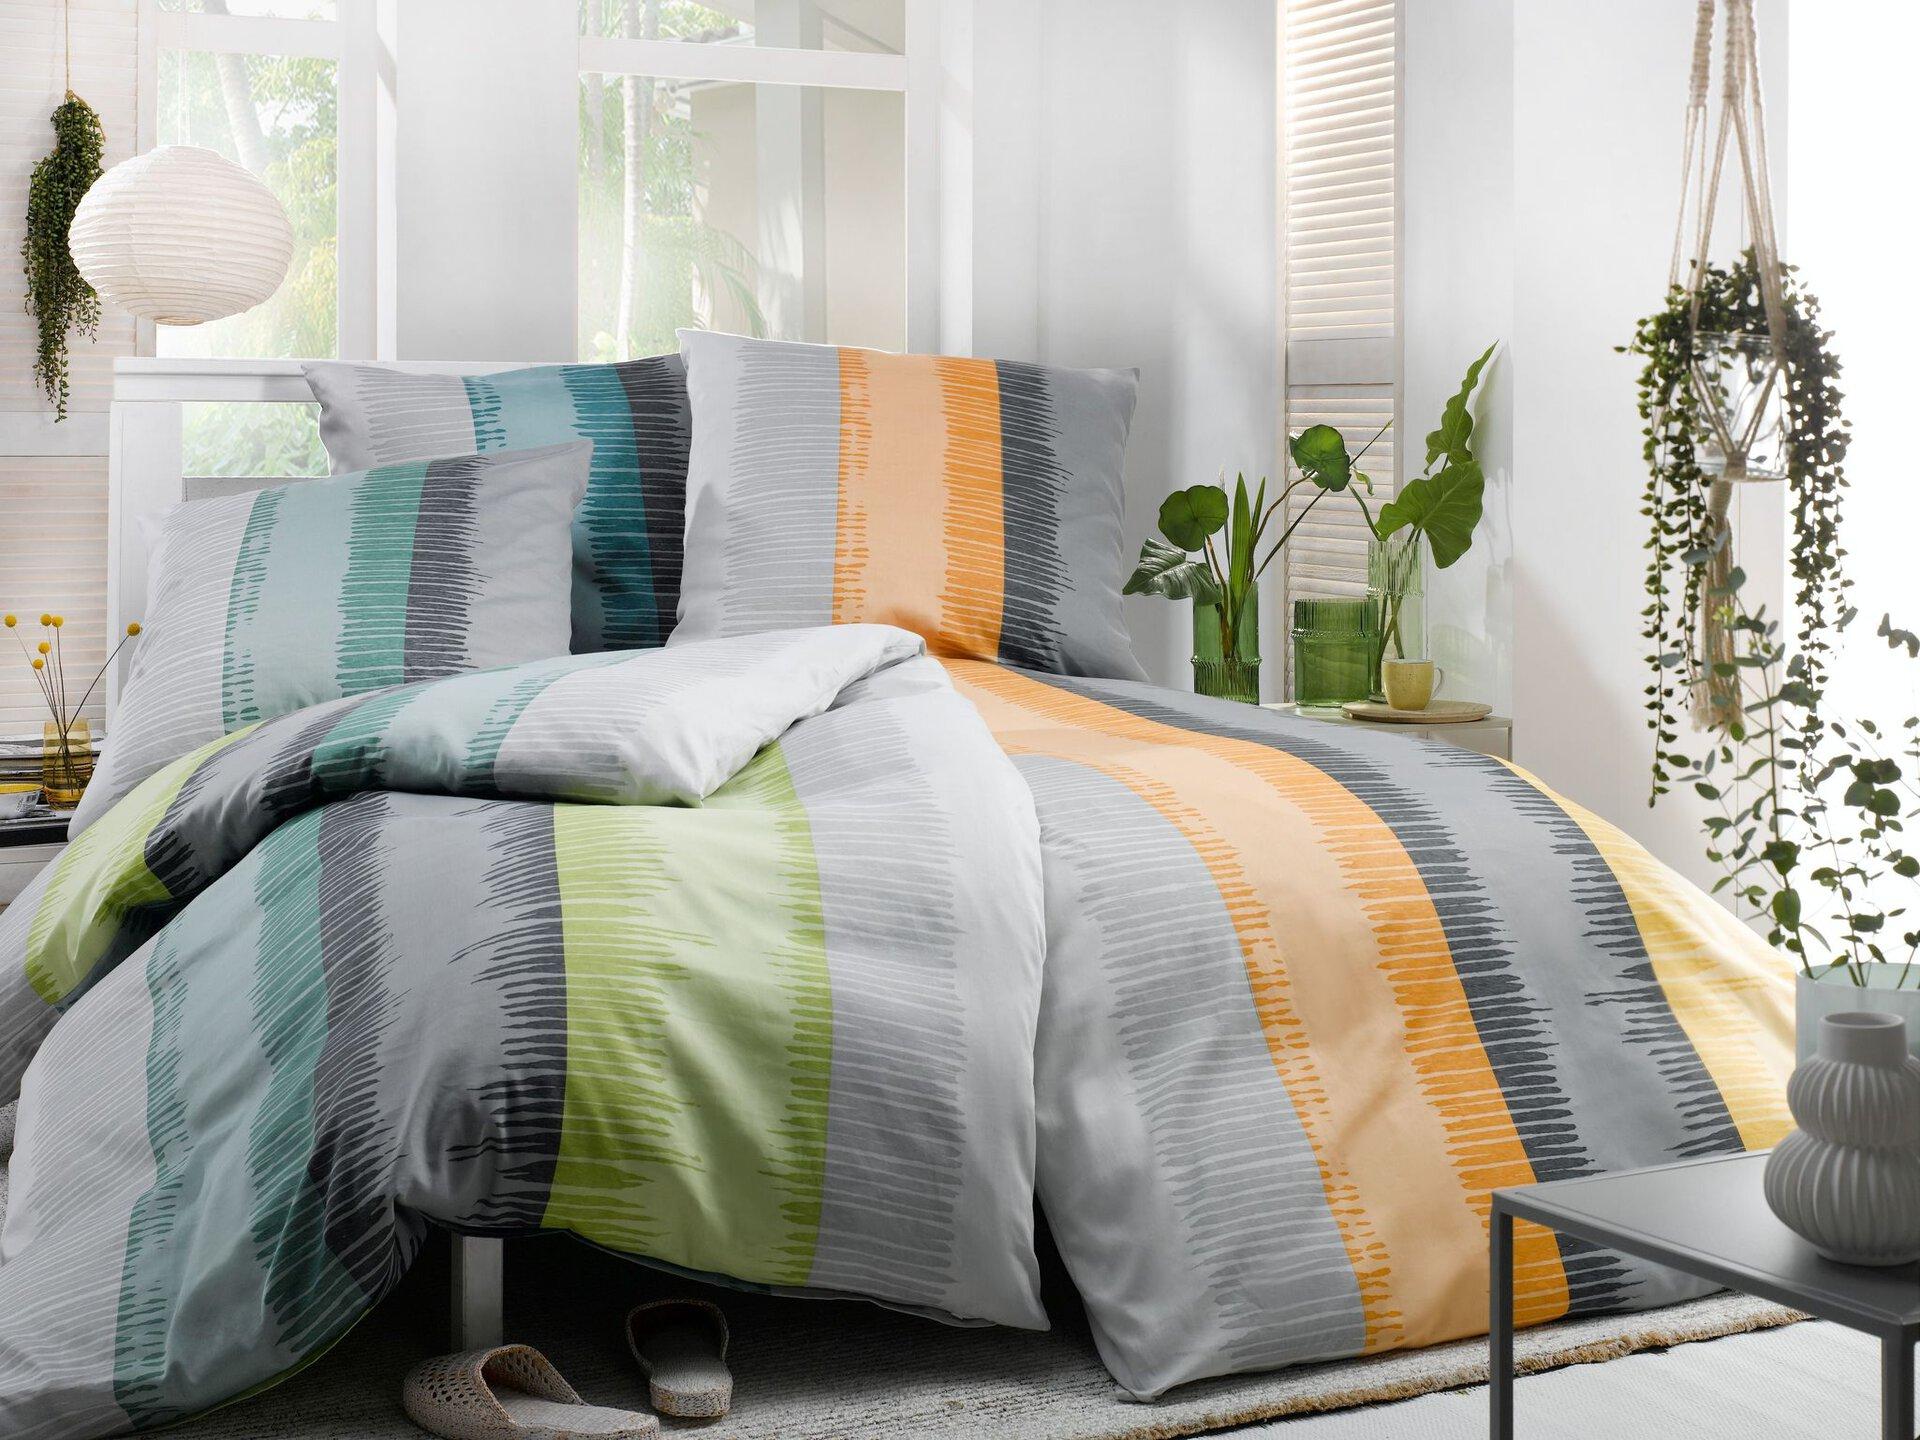 Satin-Bettwäsche Geoline Casa Nova Textil grün 135 x 200 x 200 cm